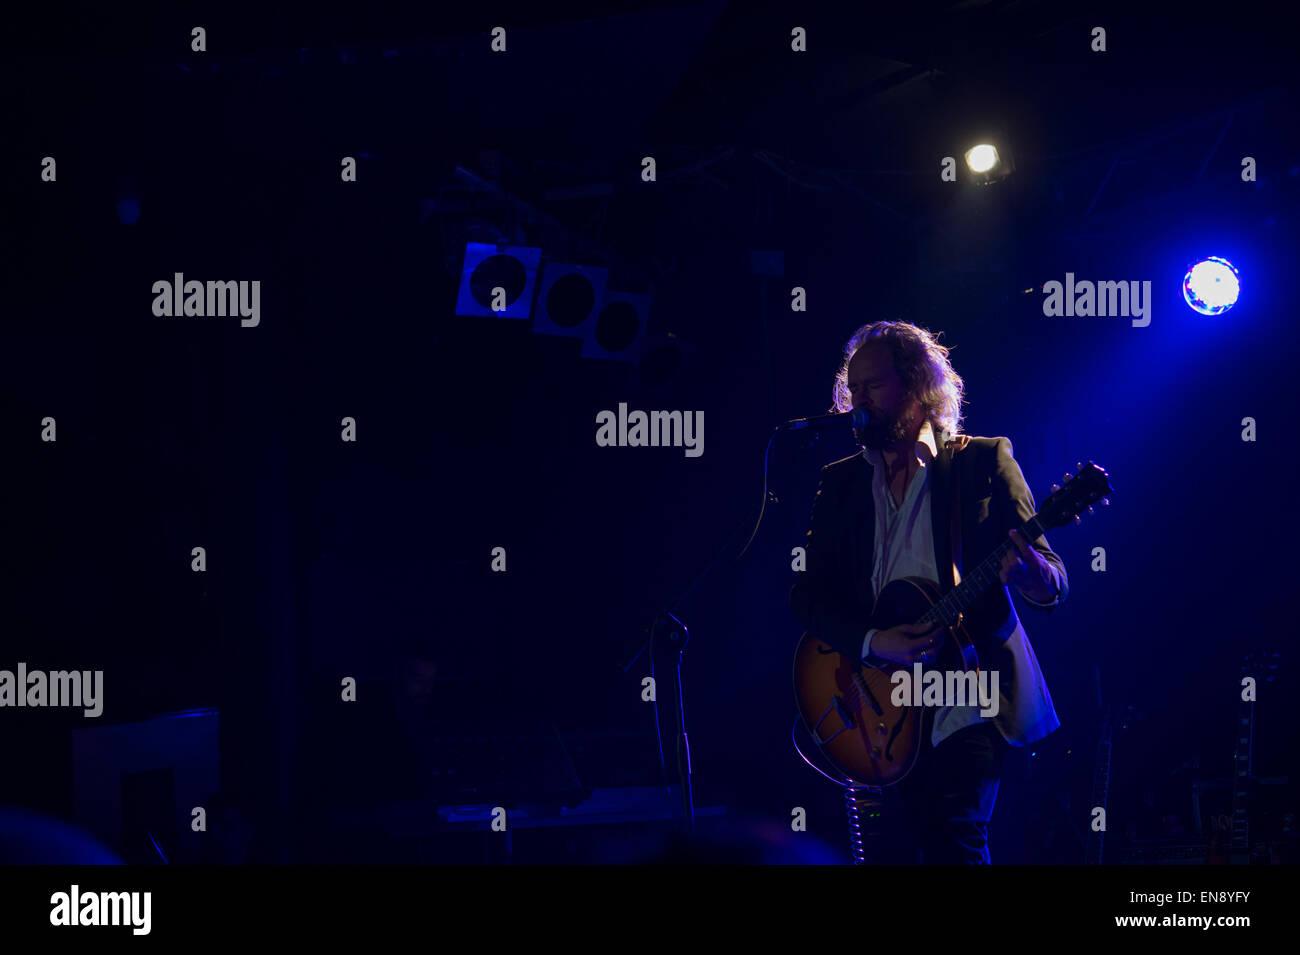 Duke Garwood Band, Orion Club, Ciampino, Rome, Italy 5-03-2015 - Stock Image